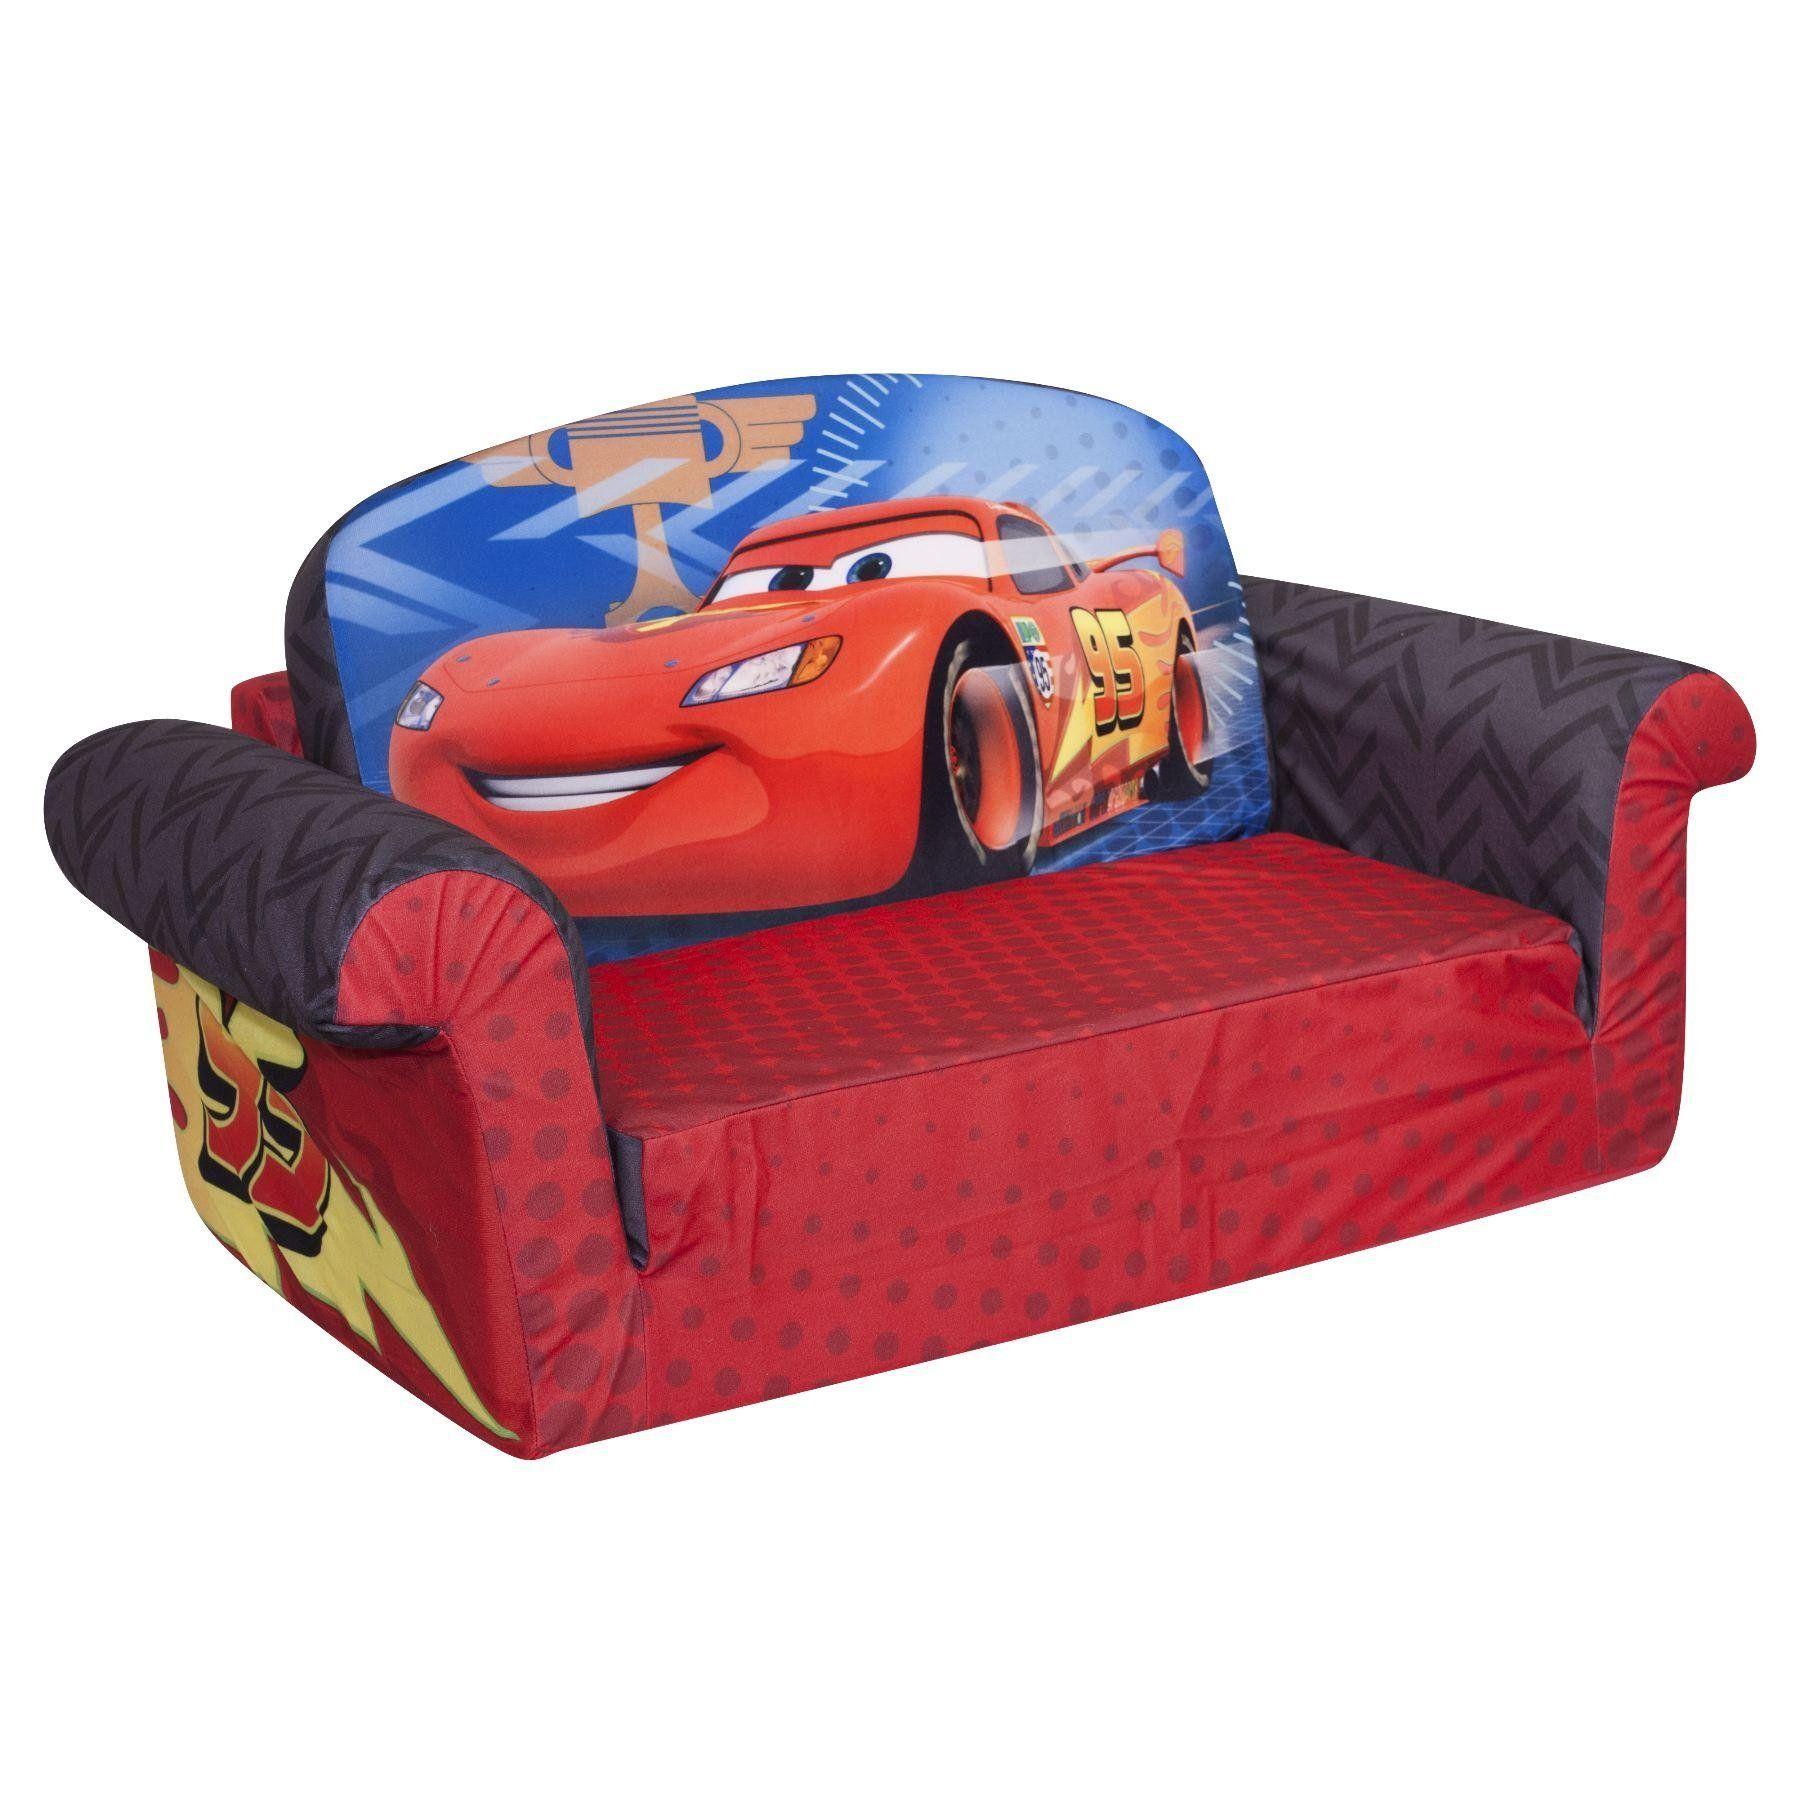 Amazon Com Marshmallow Children S Furniture 2 In 1 Flip Open Sofa Disney Cars 2 Toys Games Kids Sofa Toddler Sofa Foam Sofa